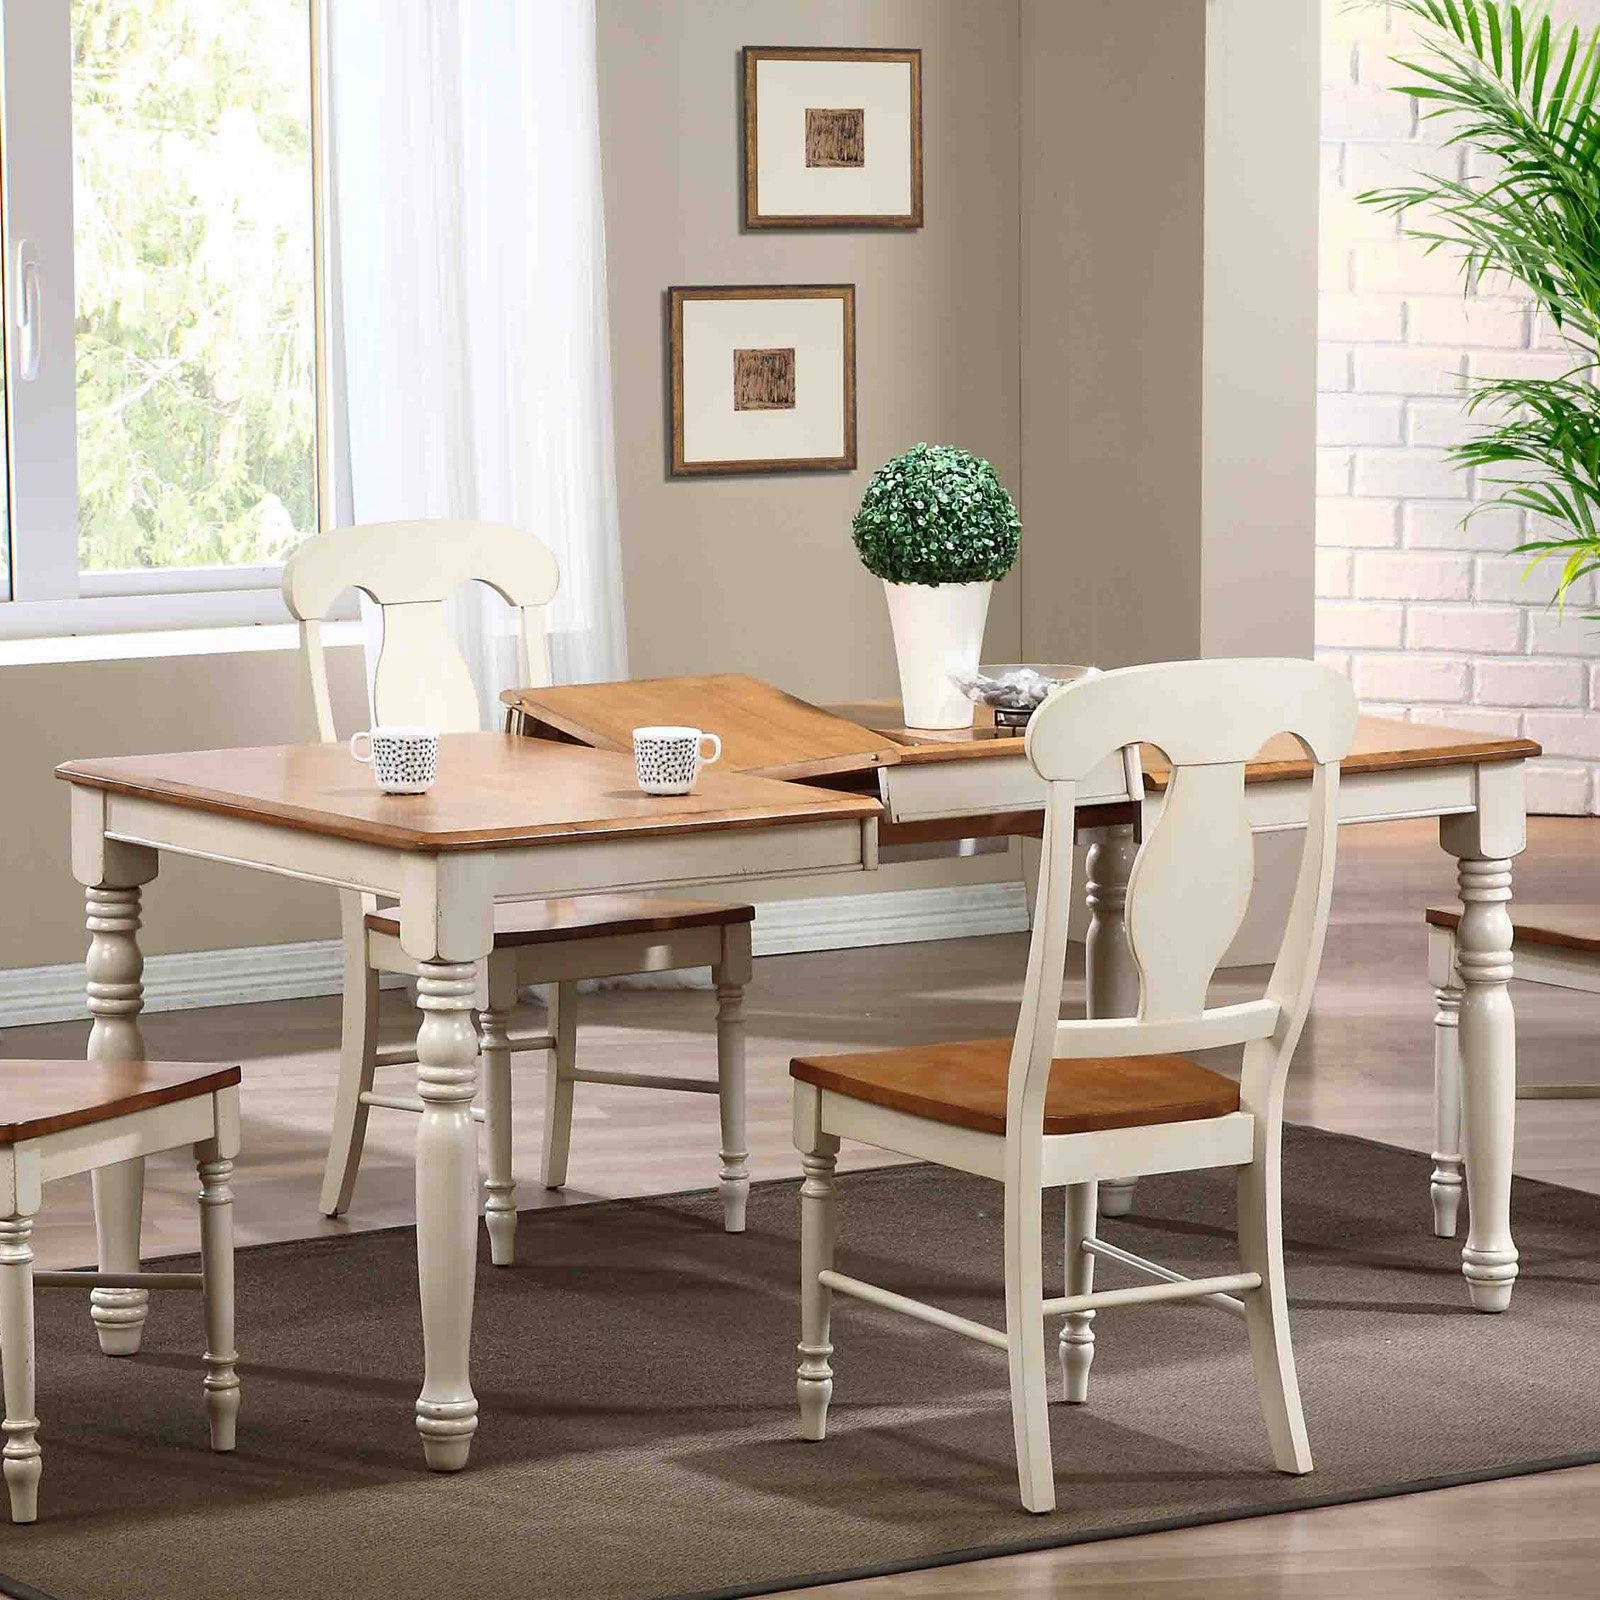 Iconic Furniture Turned Leg Rectangular Dining Table - Biscotti / Caramel